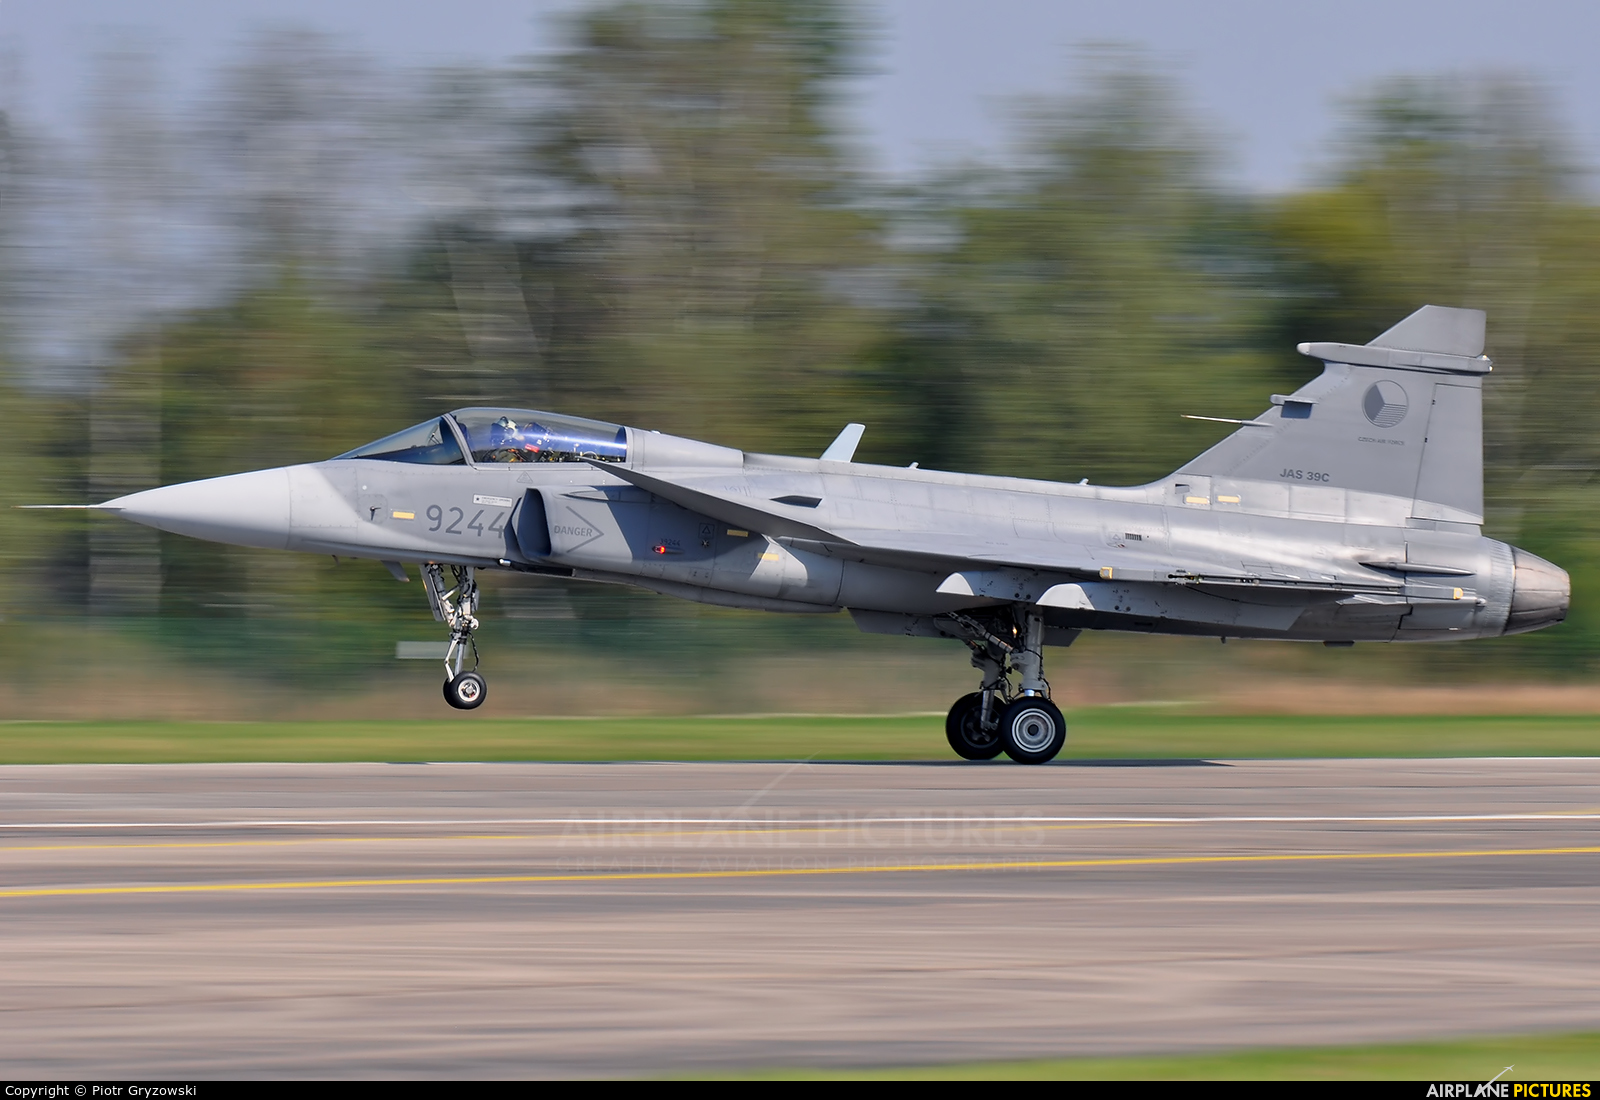 Czech - Air Force 9244 aircraft at Hradec Králové